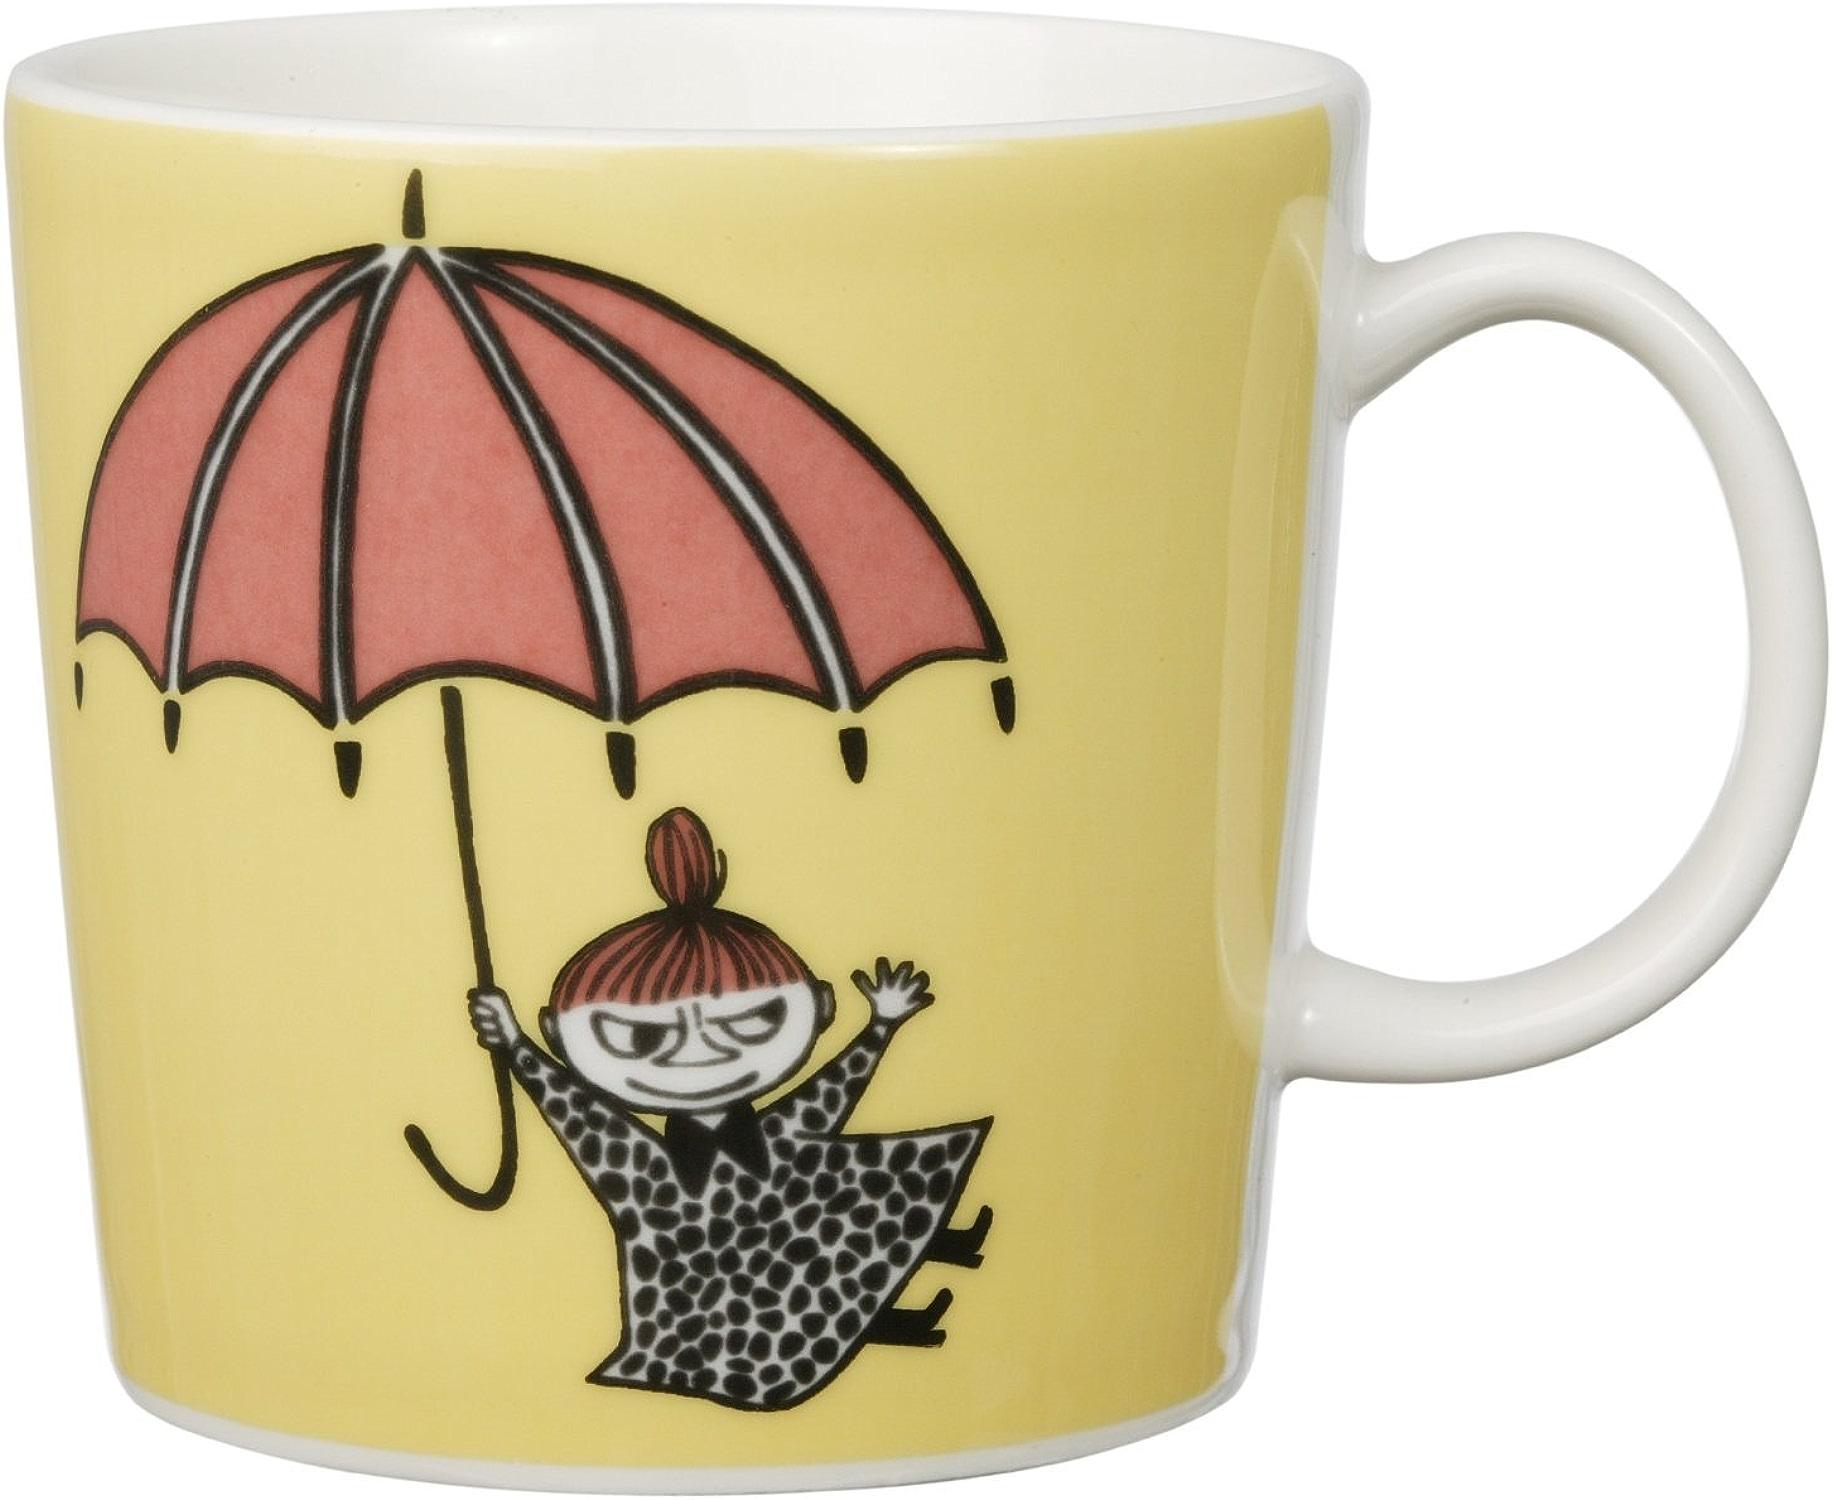 Arabia Finland Moomin Mug - Peu My (japan import)